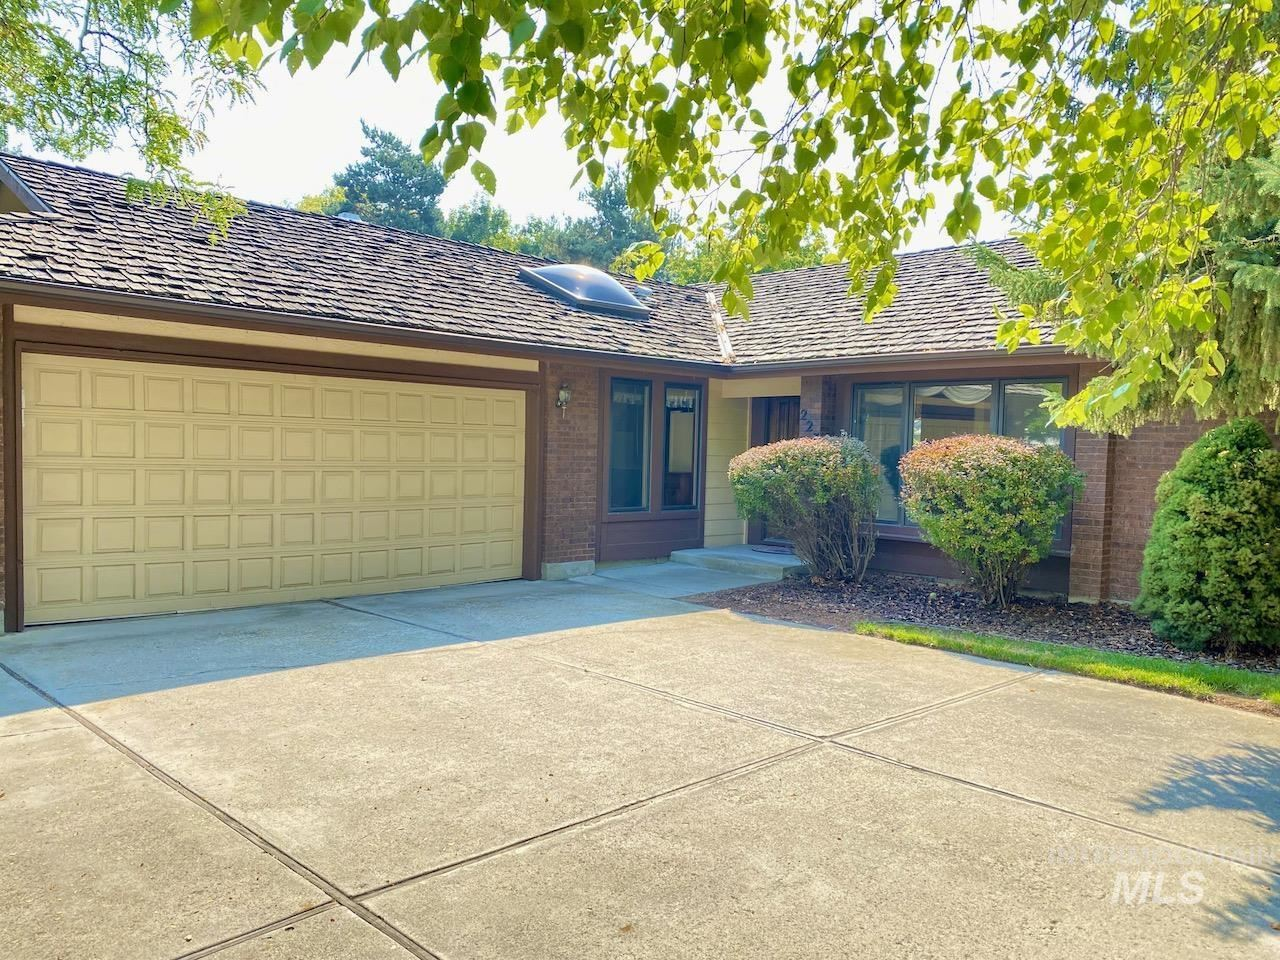 223 E Old Saybrook, Boise, ID 83706 - MLS#: 98811328